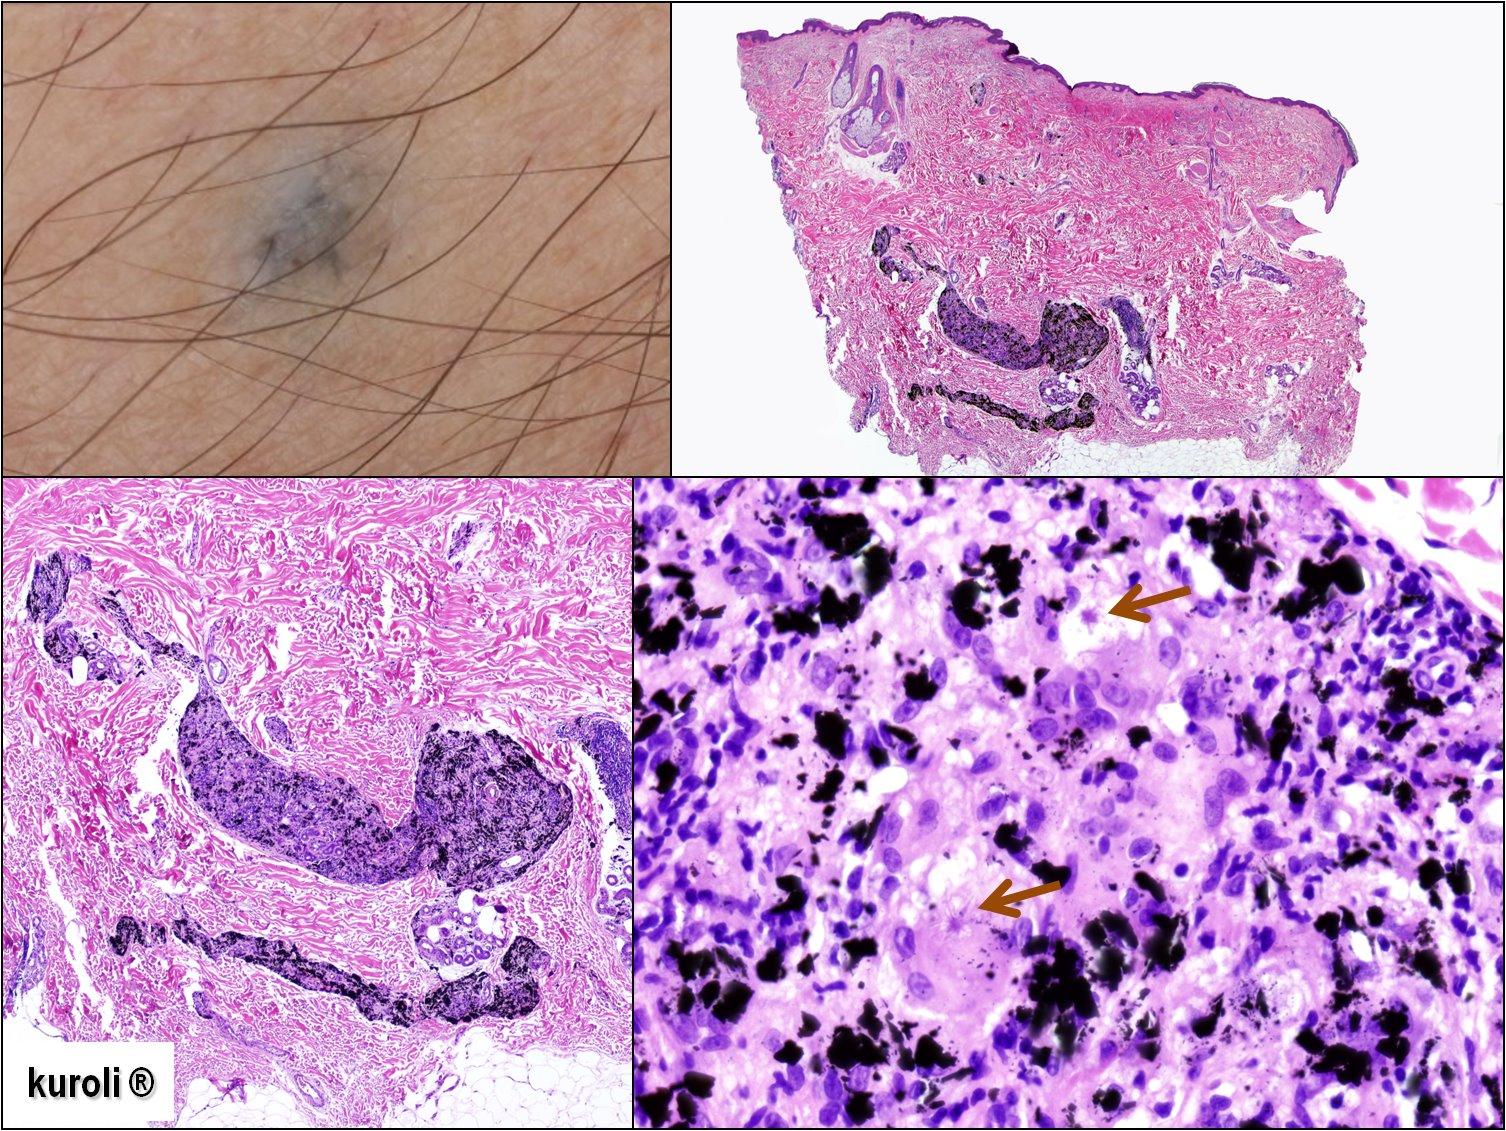 papillomatosis bőrpatológia intraductalis papilloma viszket